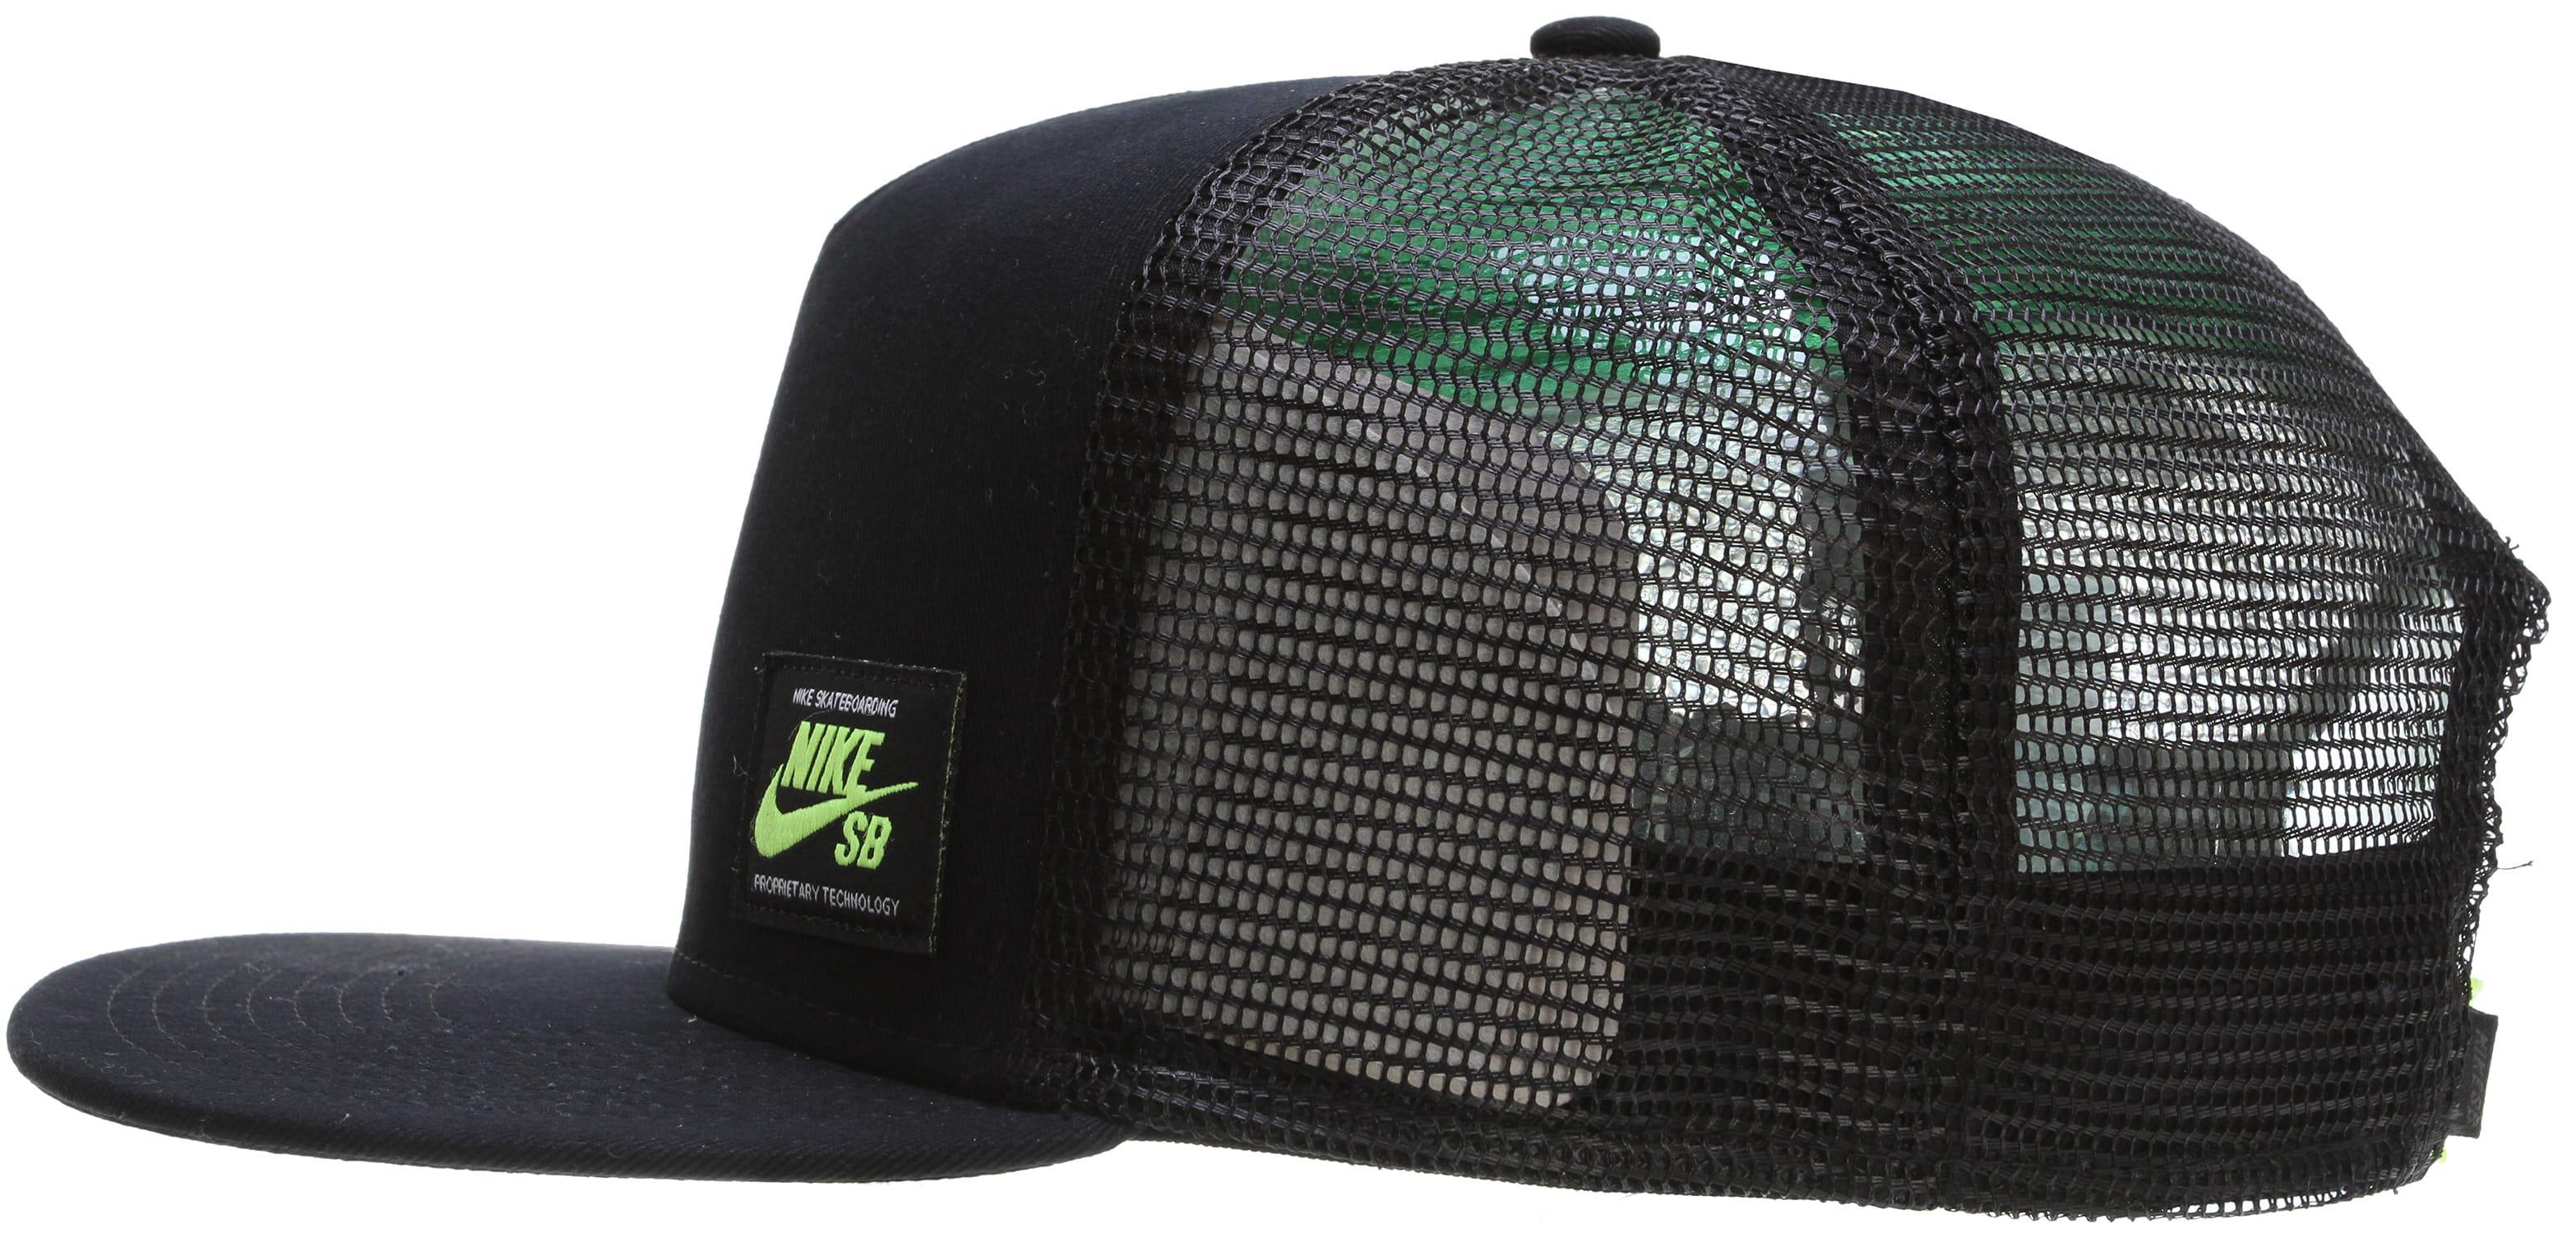 Nike Sb Verde Bloqueo Casquillo Del Camionero descuento barato venta auténtica precio barato comercializable sneakernews de salida kcwh2H